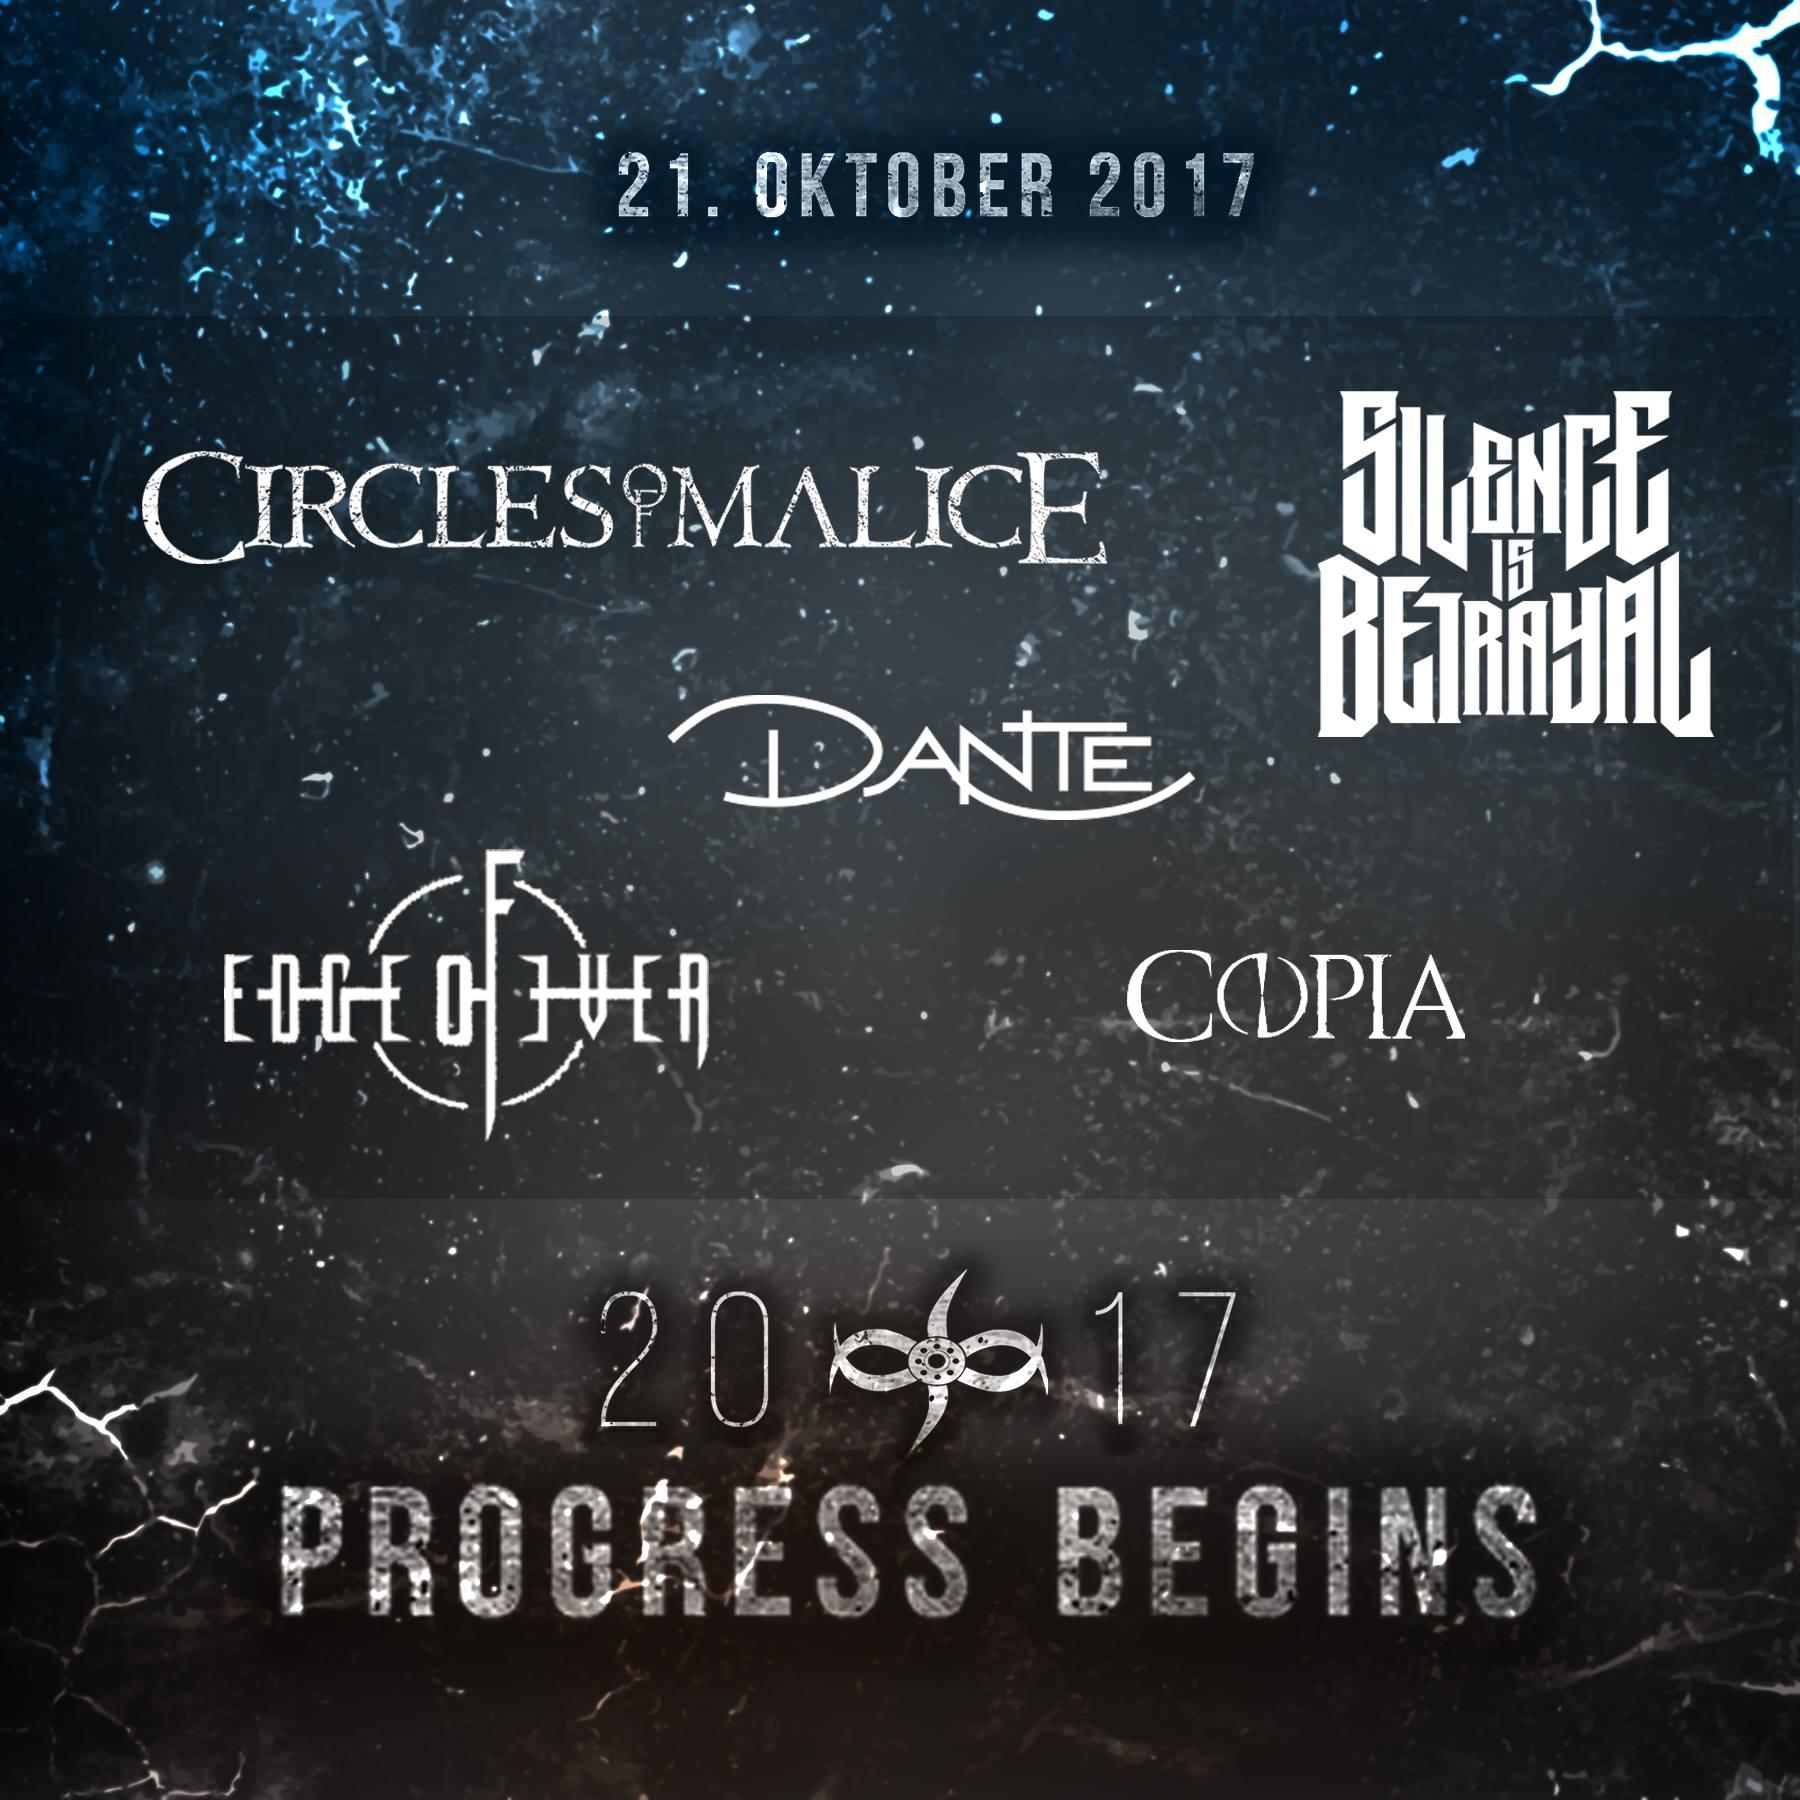 Progress Begins Festival 2017